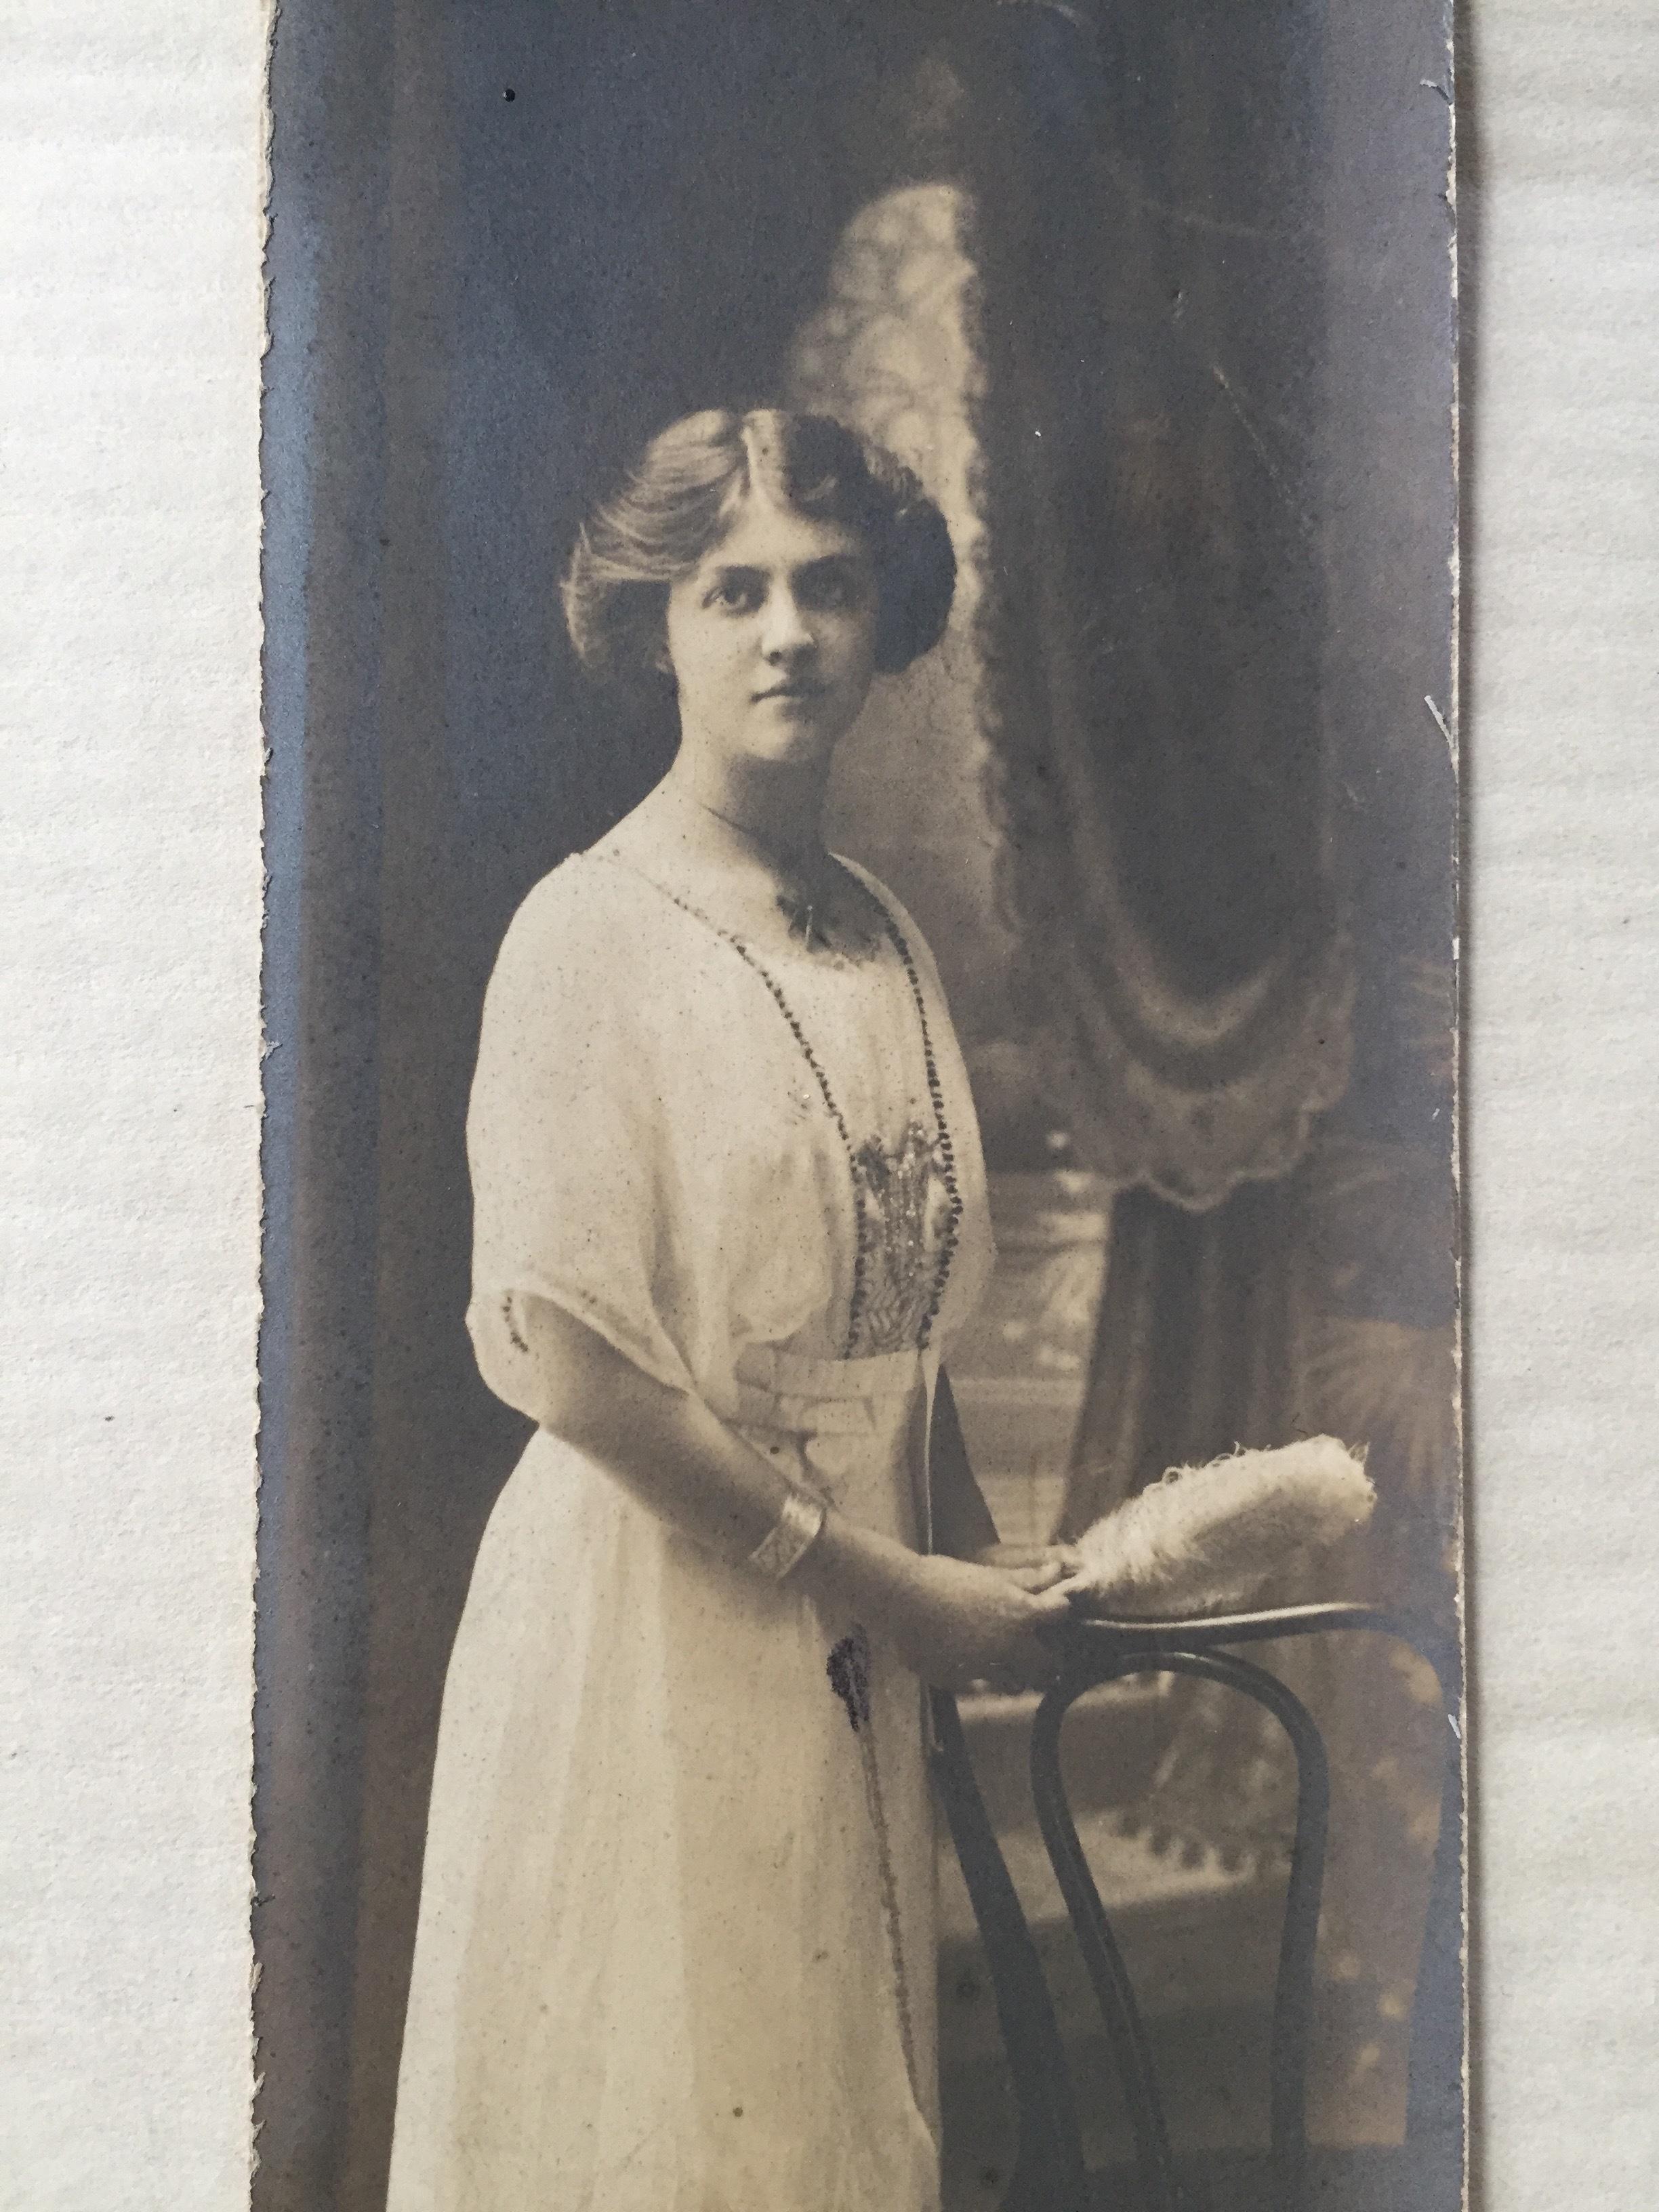 Helen Jones, seen here in 1917, worked as a music teacher before she became a war nurse. (Submitted: Howard van Allen)